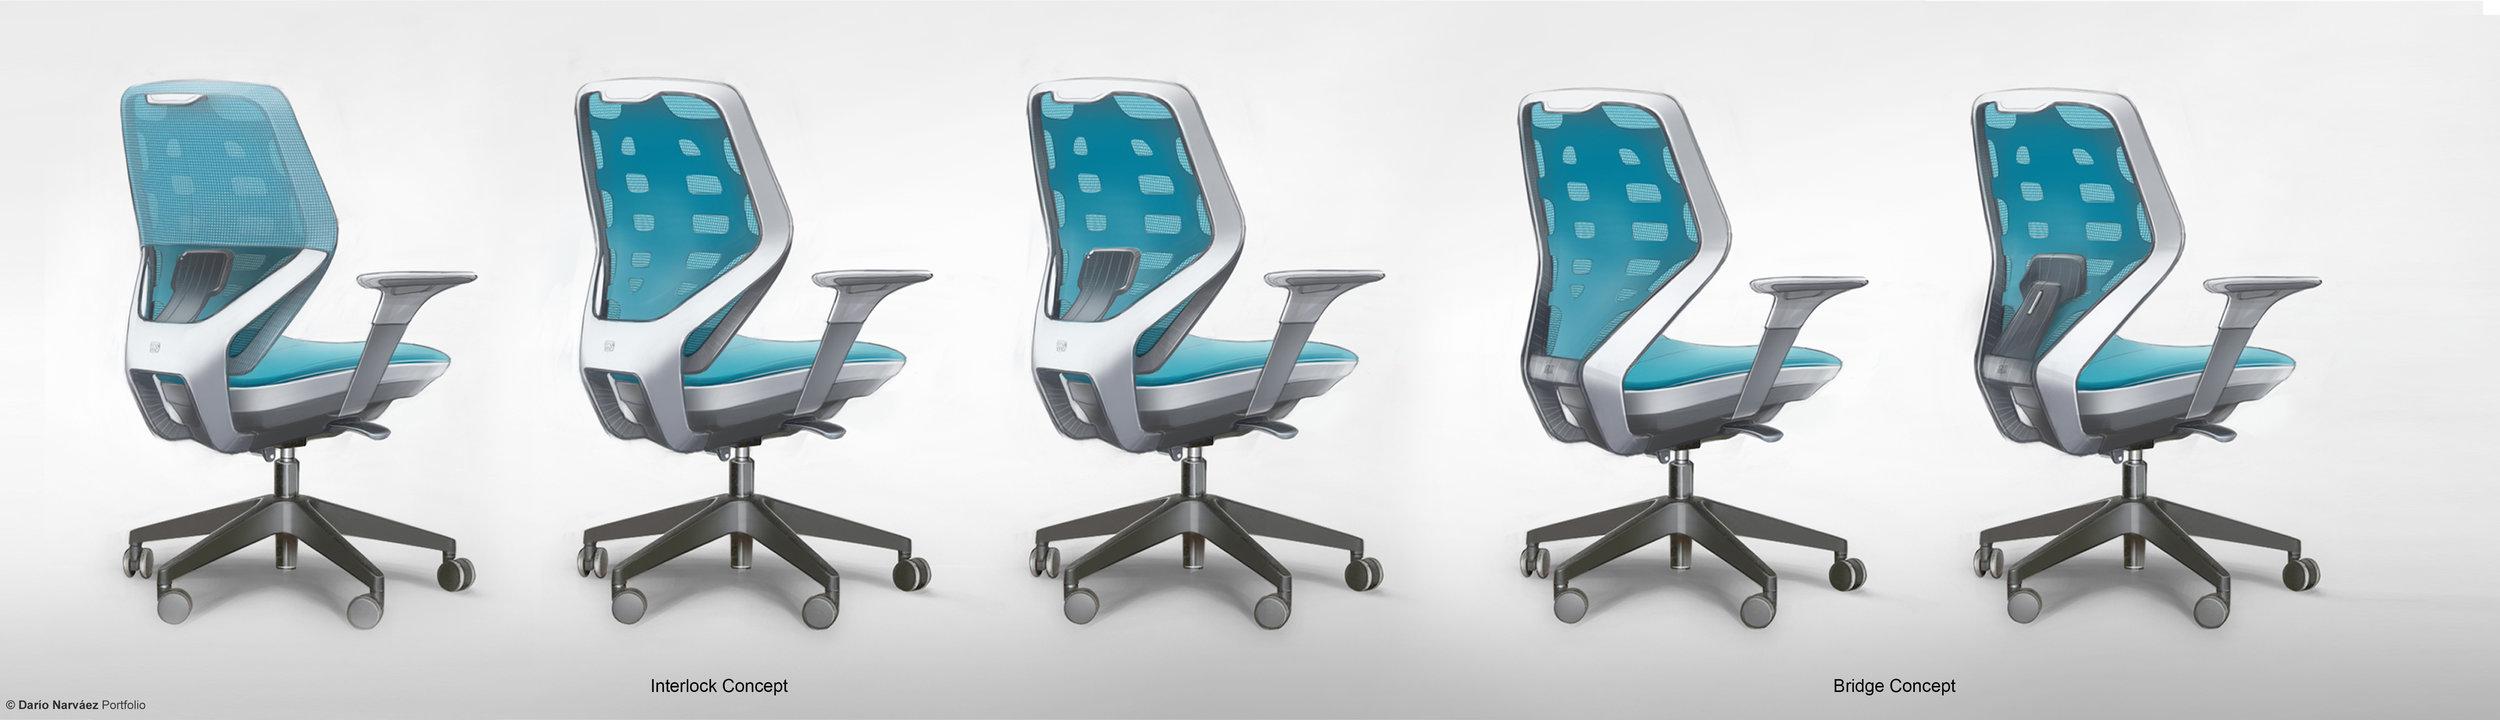 02H_DarioNarvaez_Portfolio_Ingo_Chair_Concept_Development_WEB-2.jpg